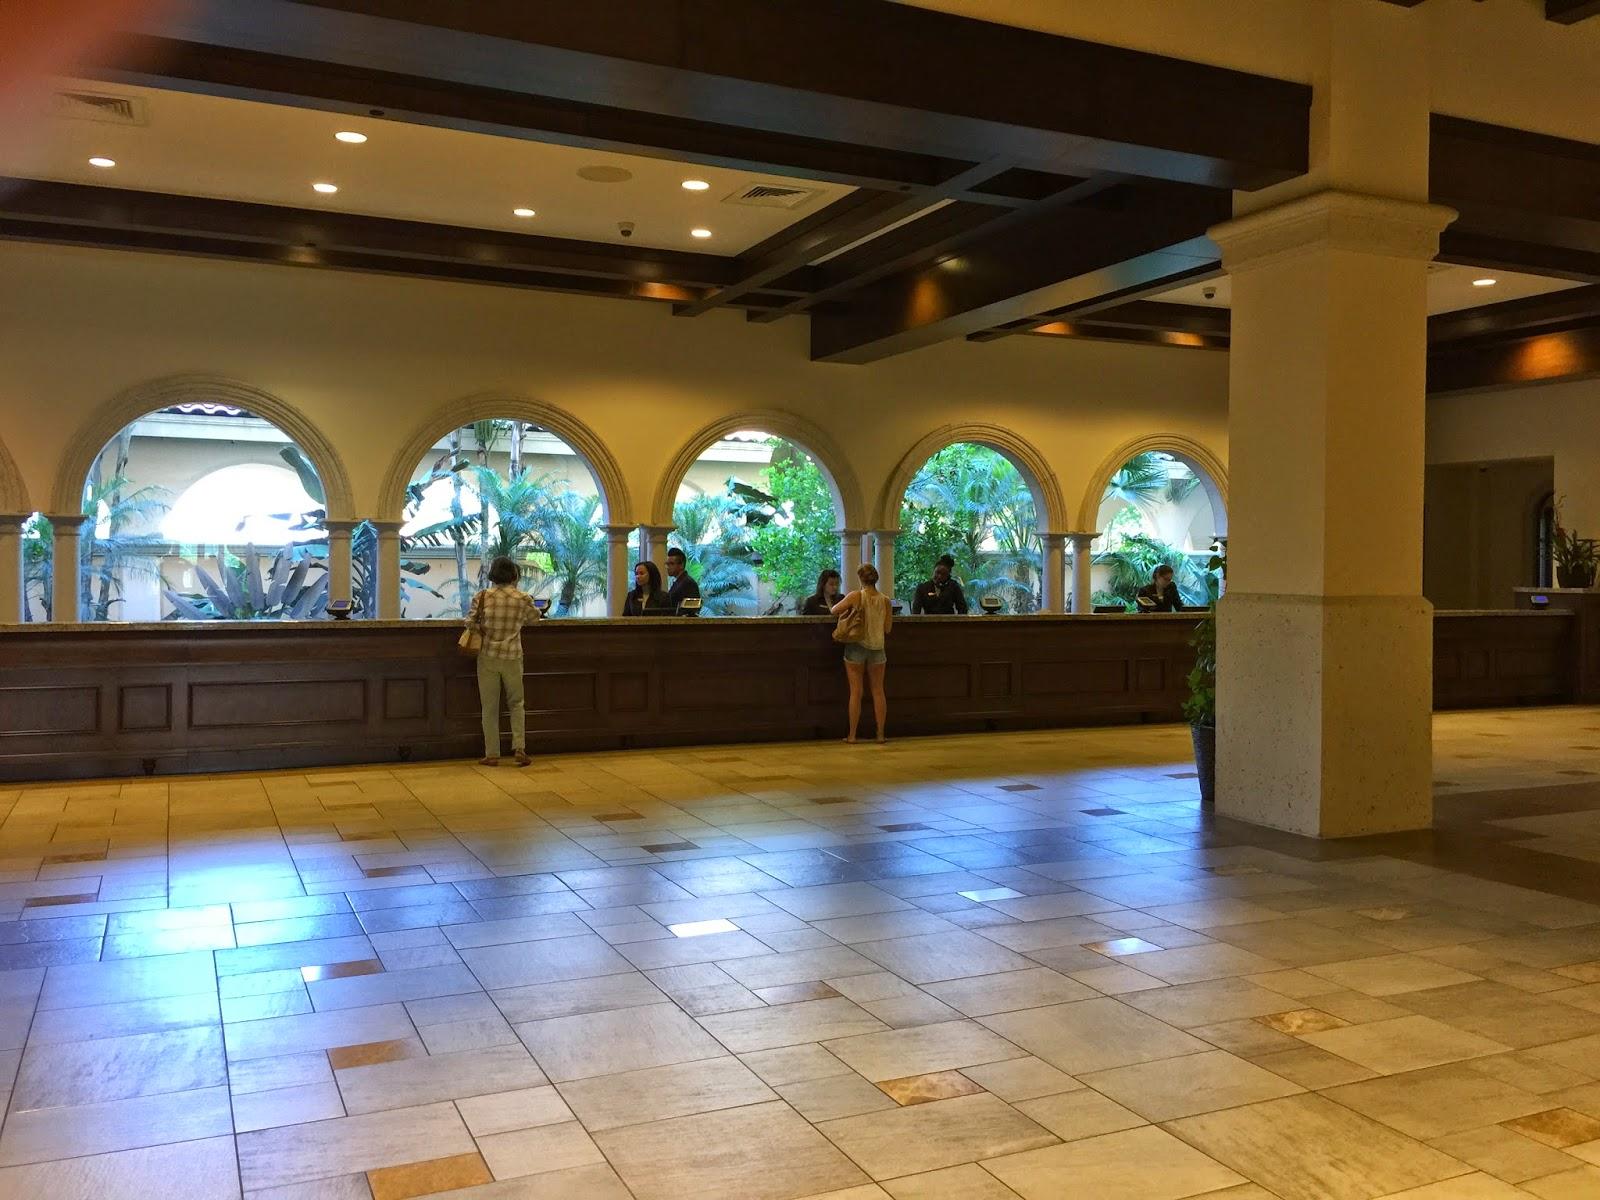 TASTE OF HAWAII: ROSEN SHINGLE CREEK